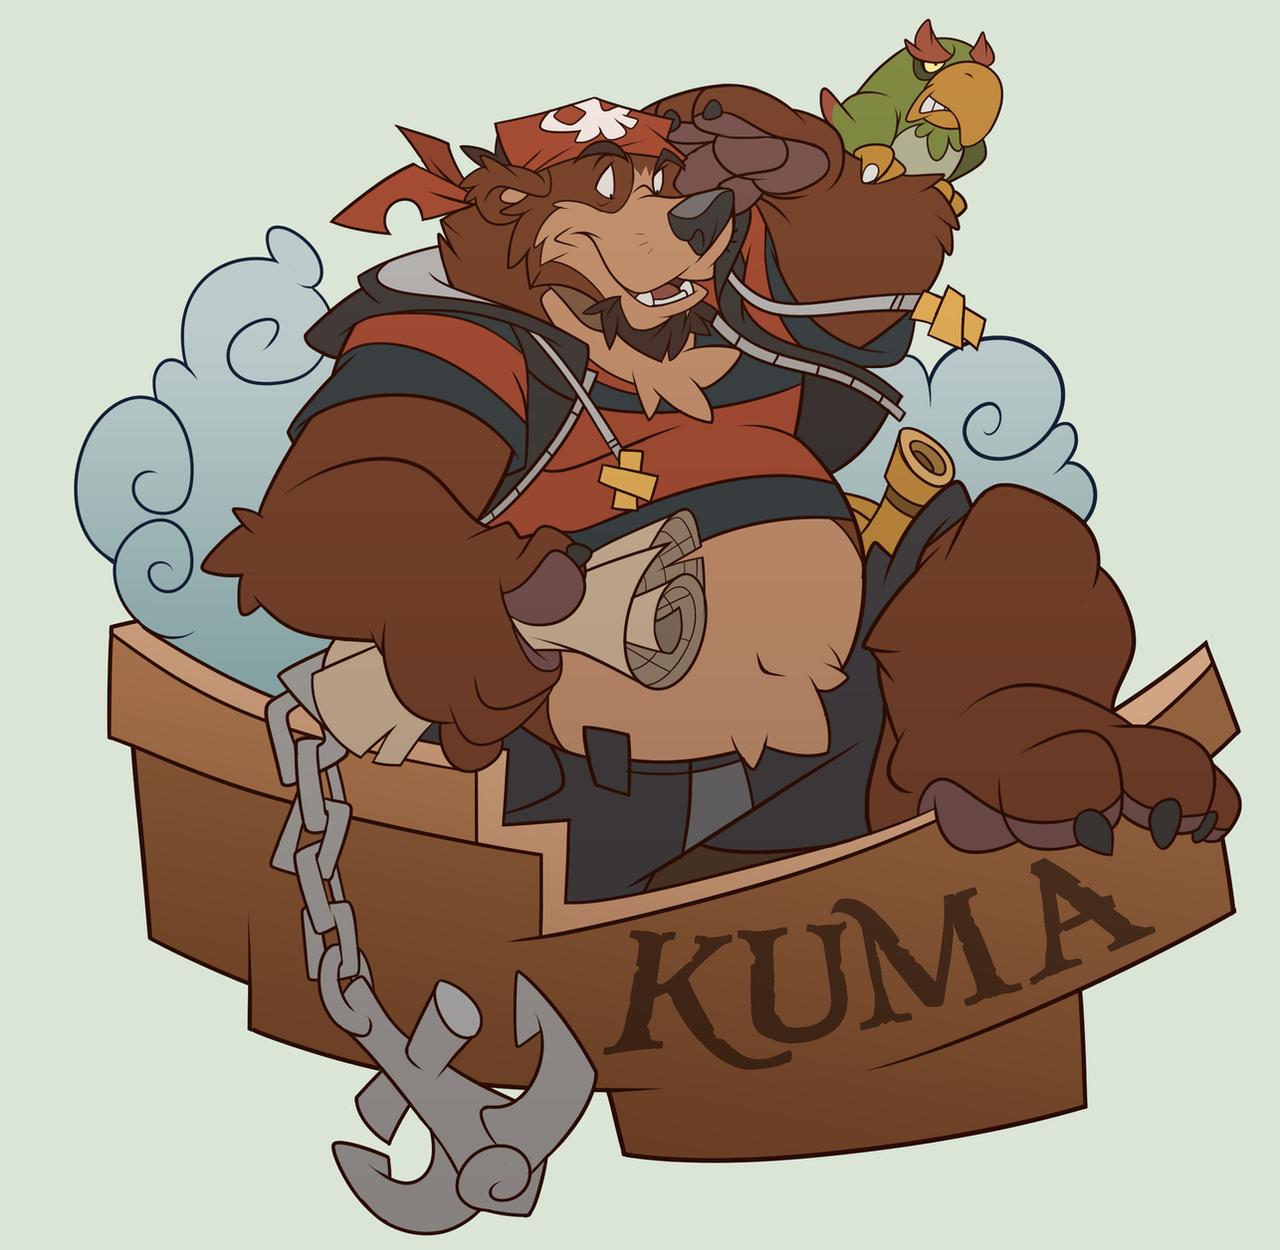 DrawingKuma's Profile Picture